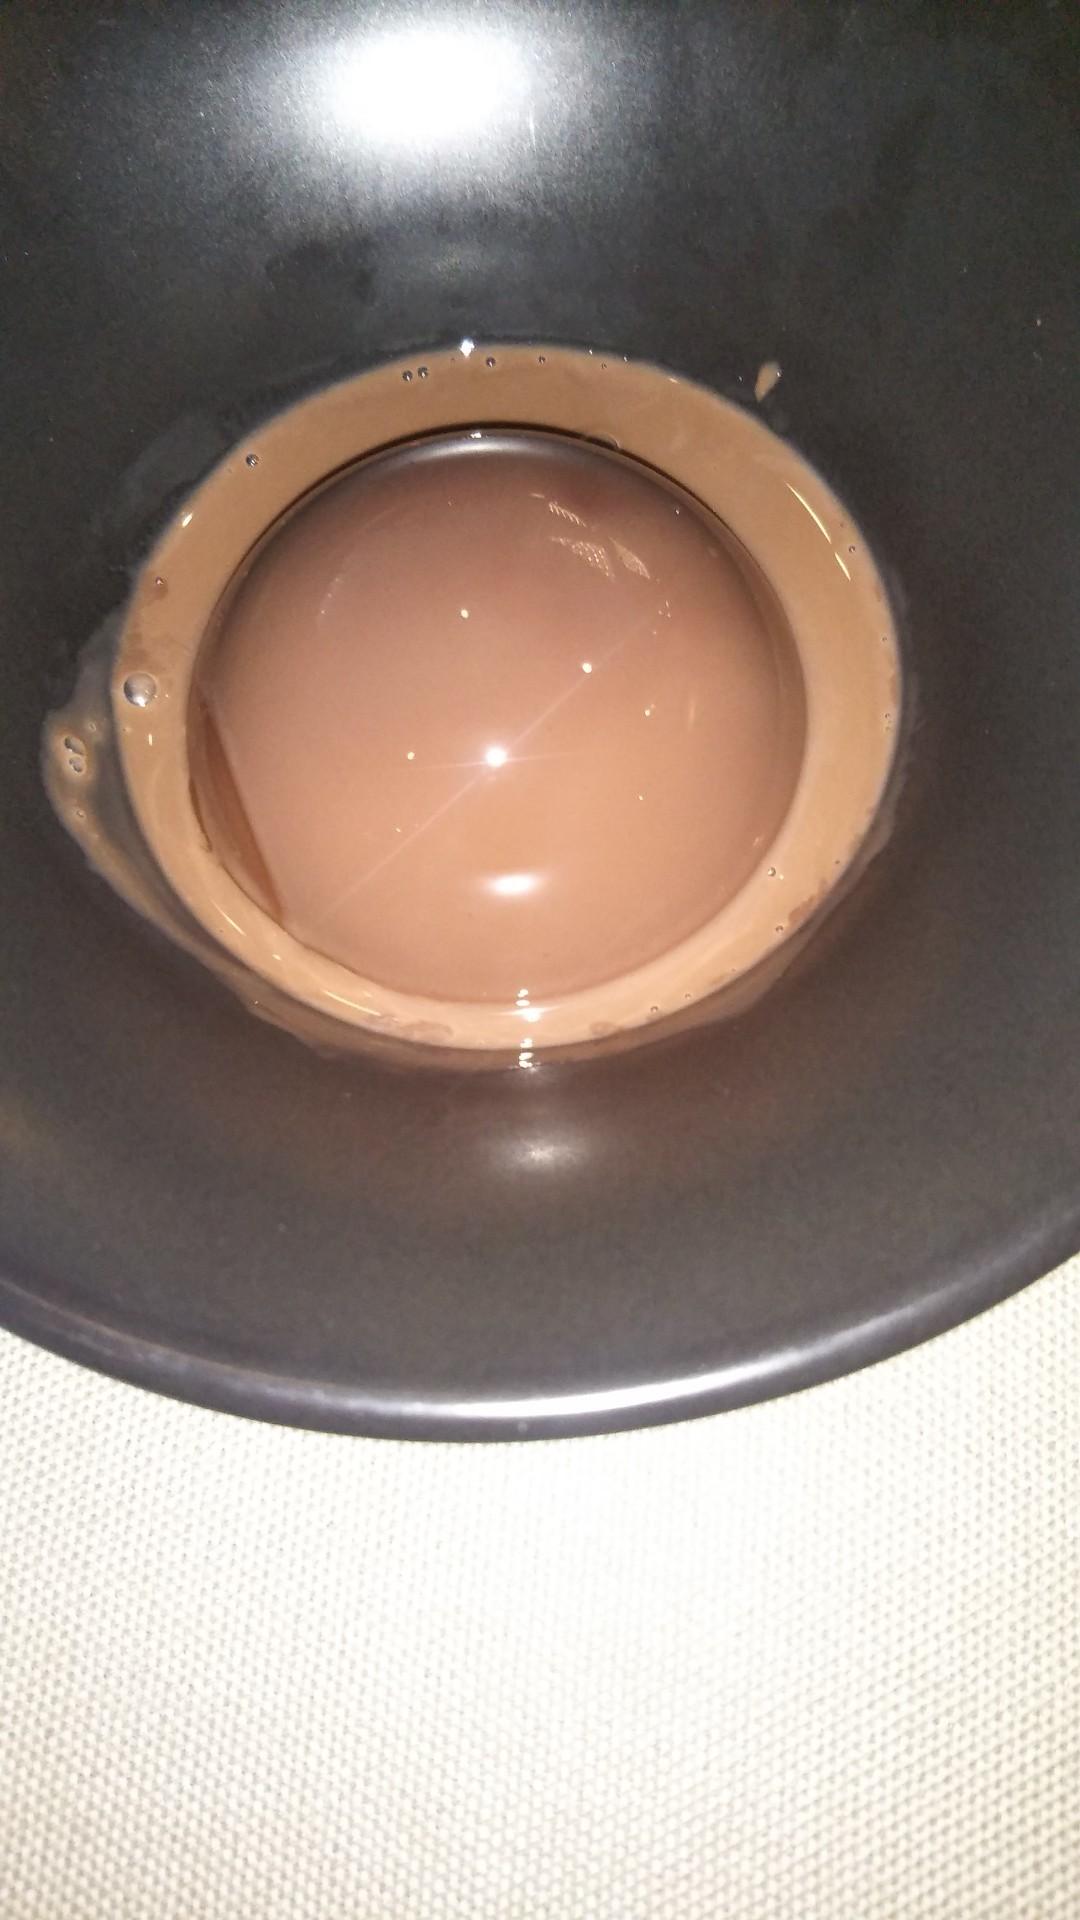 ANAインターコンチネンタルホテル東京 シャンパン・バー チョコレート・スイーツブッフェ_f0076001_22000981.jpg